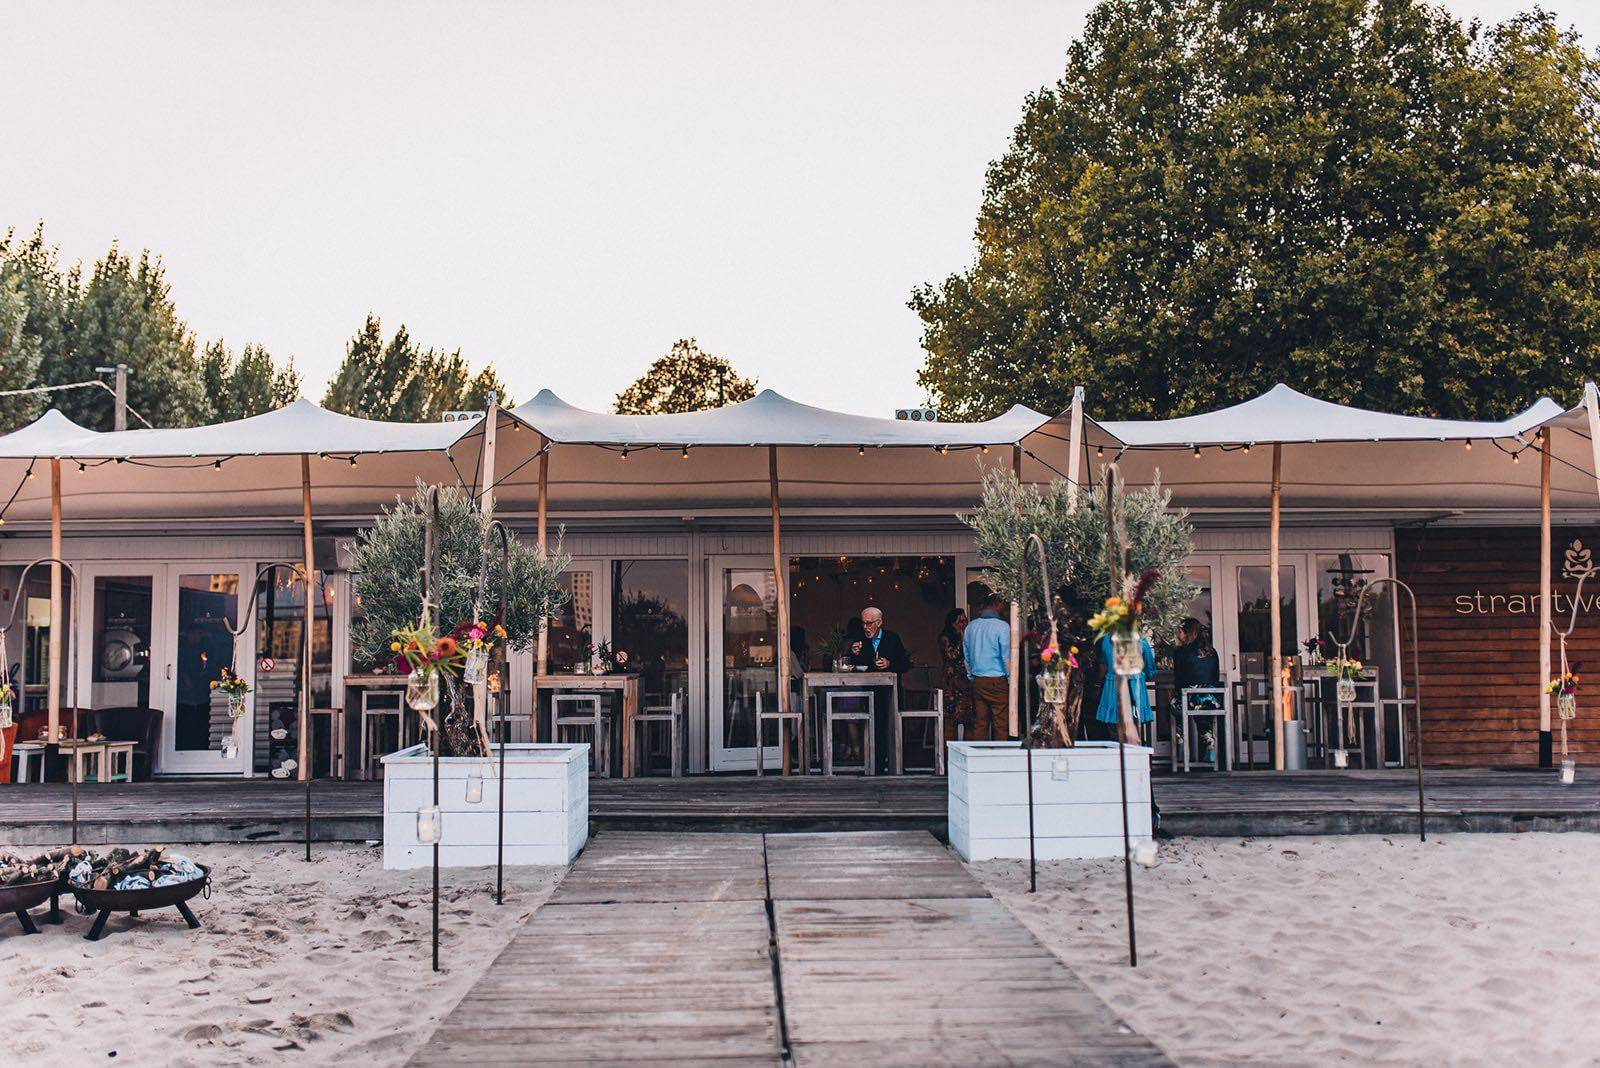 Strantwerpen - Feestzaal - Trouwzaal - Trouwen op het Strand - Fotograaf Aiki Photography - House of Weddings - 1